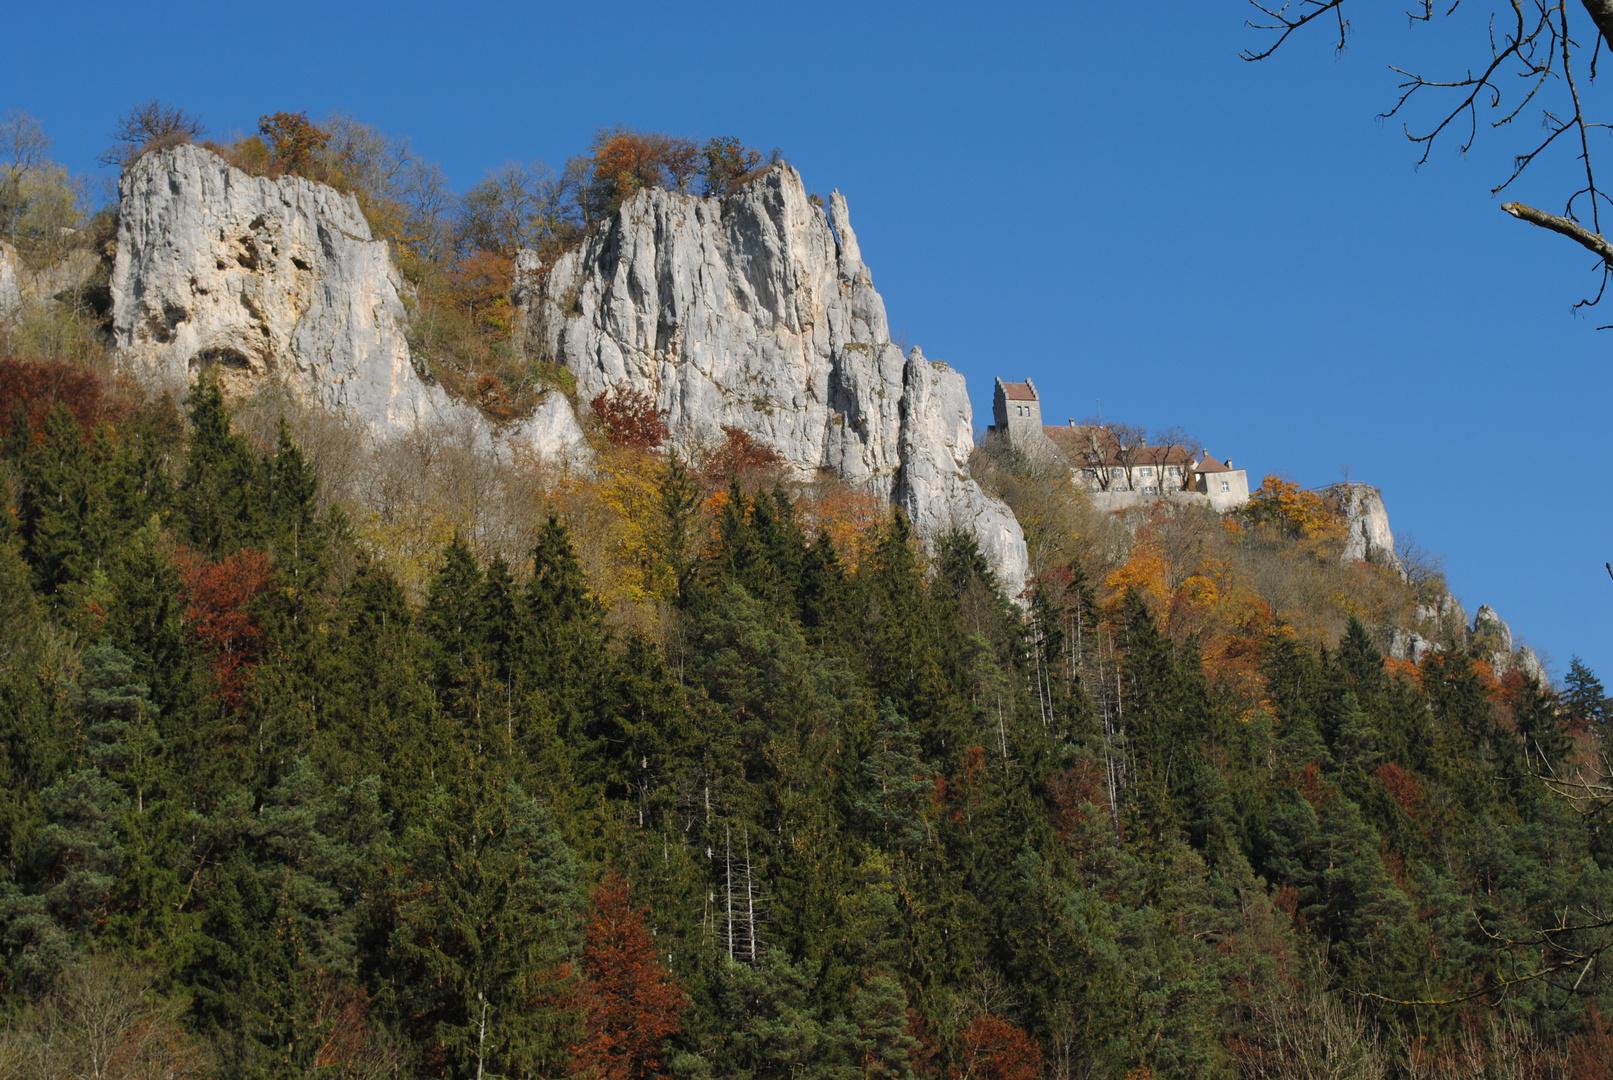 Herbst im Donautal II